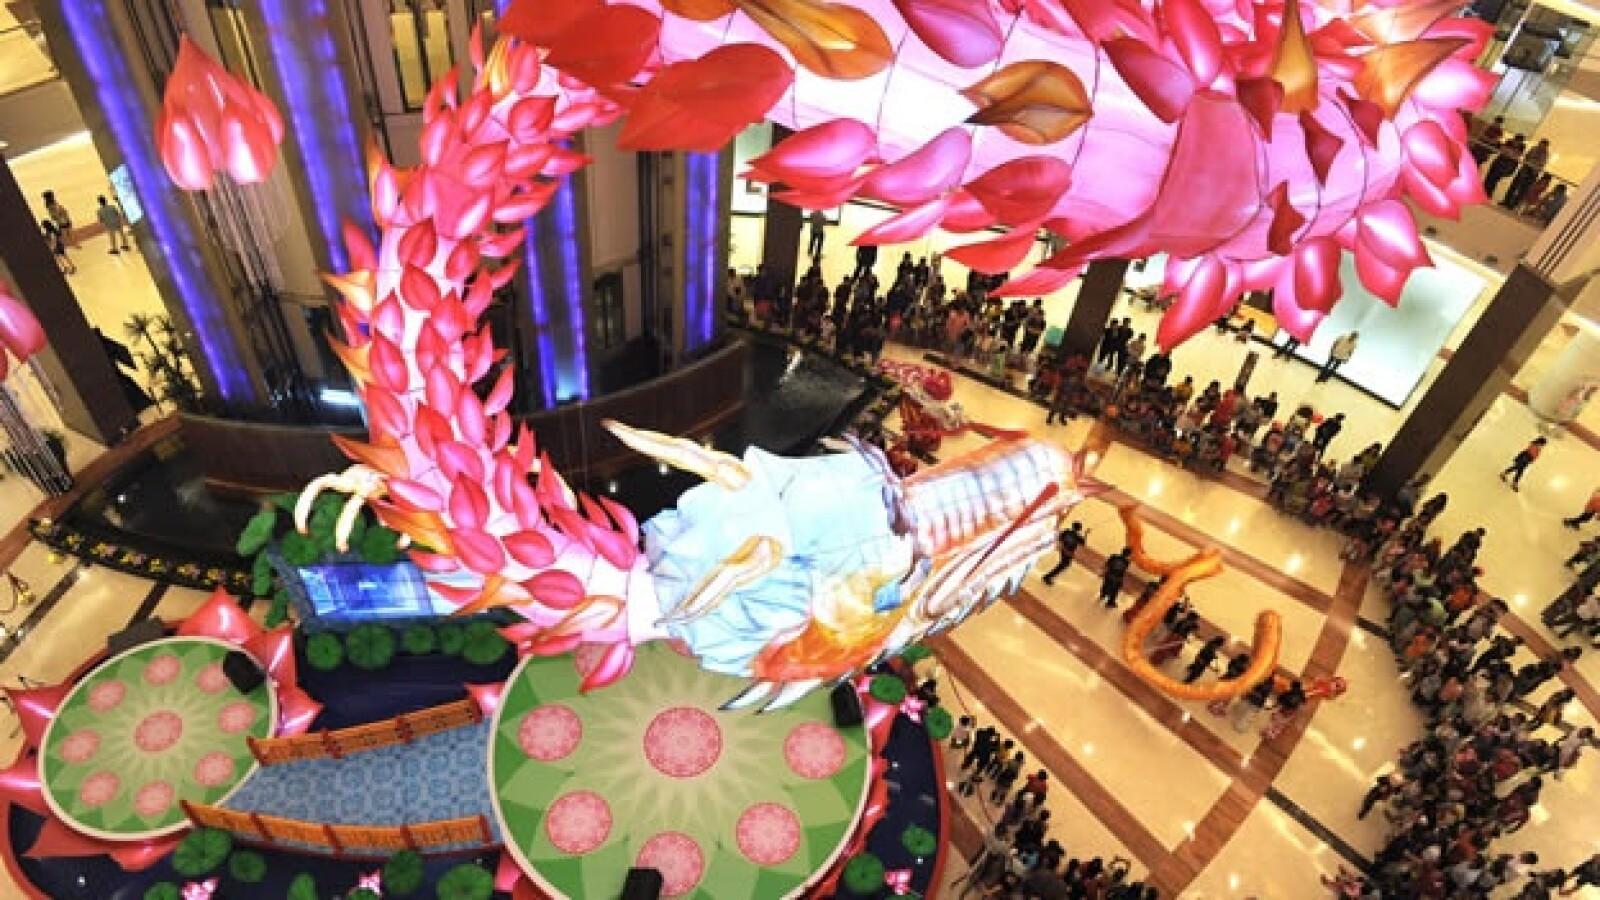 un dragon gigante en un centro comercial en indonesia